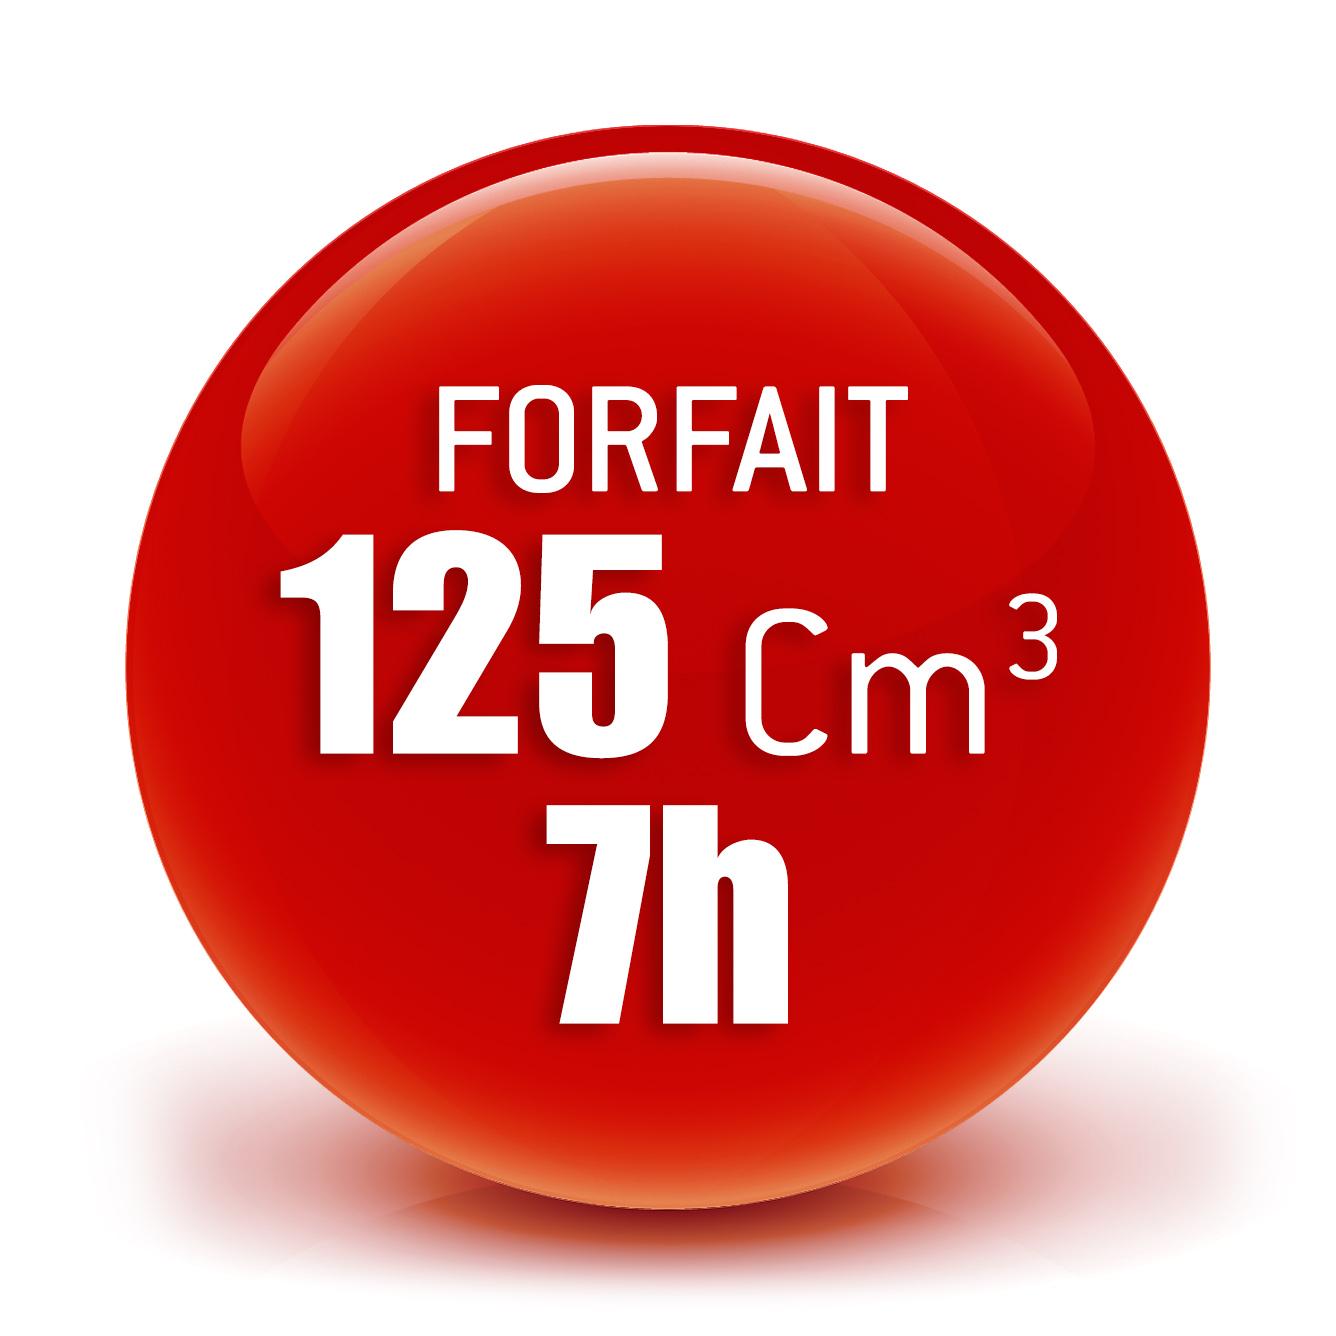 forfait 125 cc 7h auto ecole araucaria. Black Bedroom Furniture Sets. Home Design Ideas